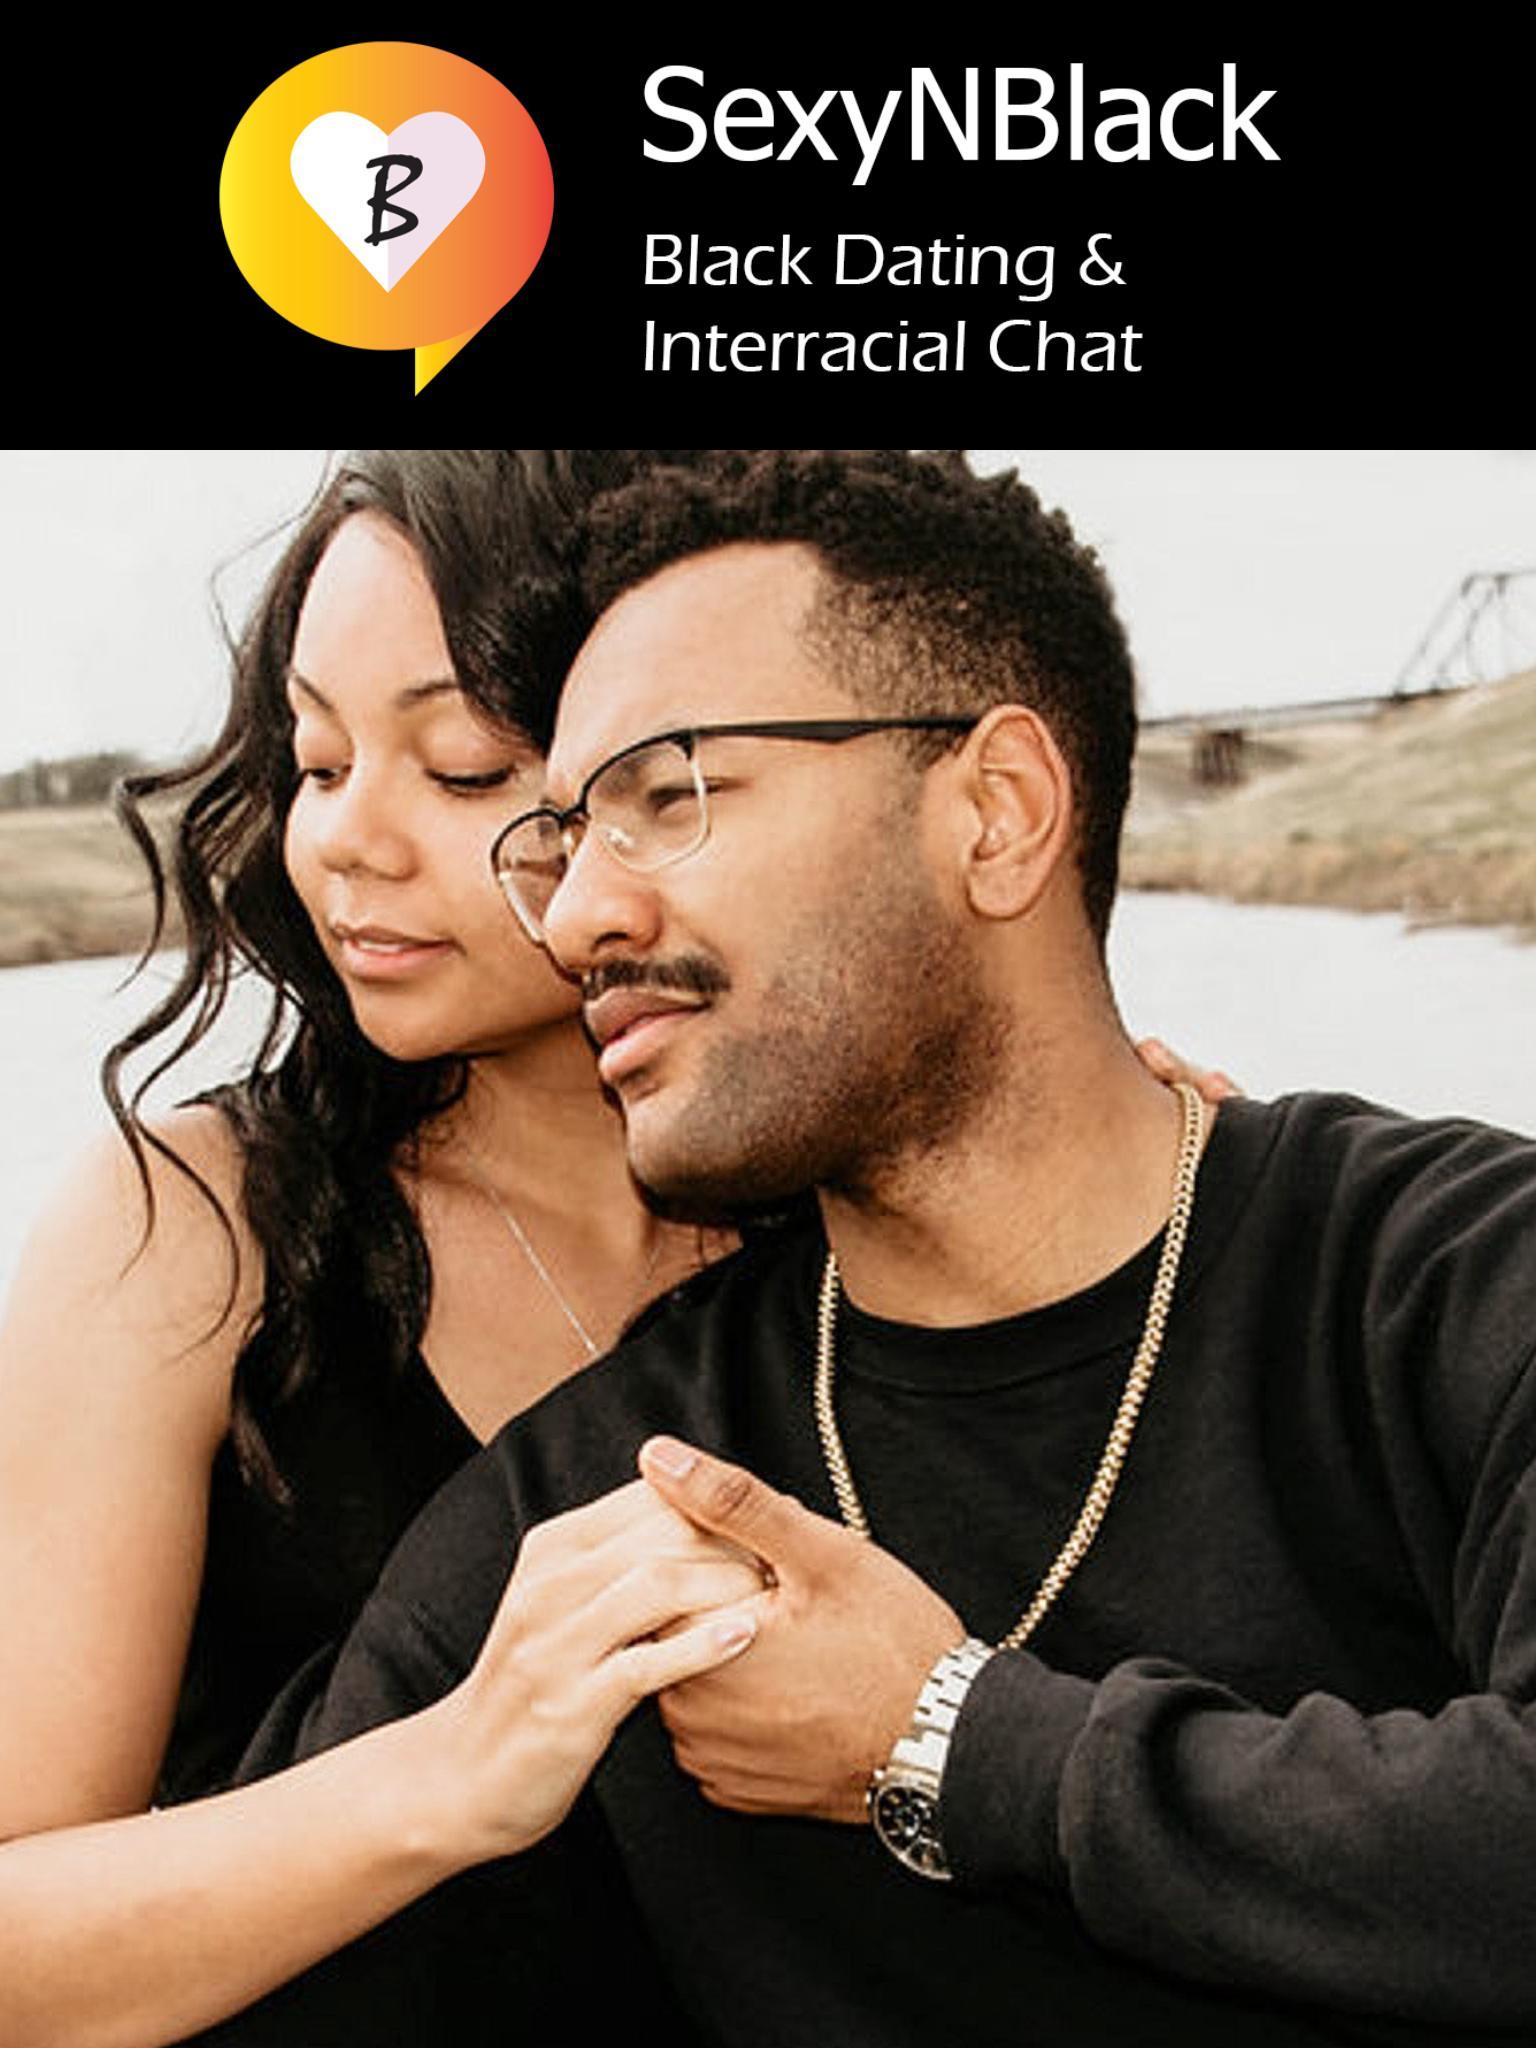 Interracial Chat